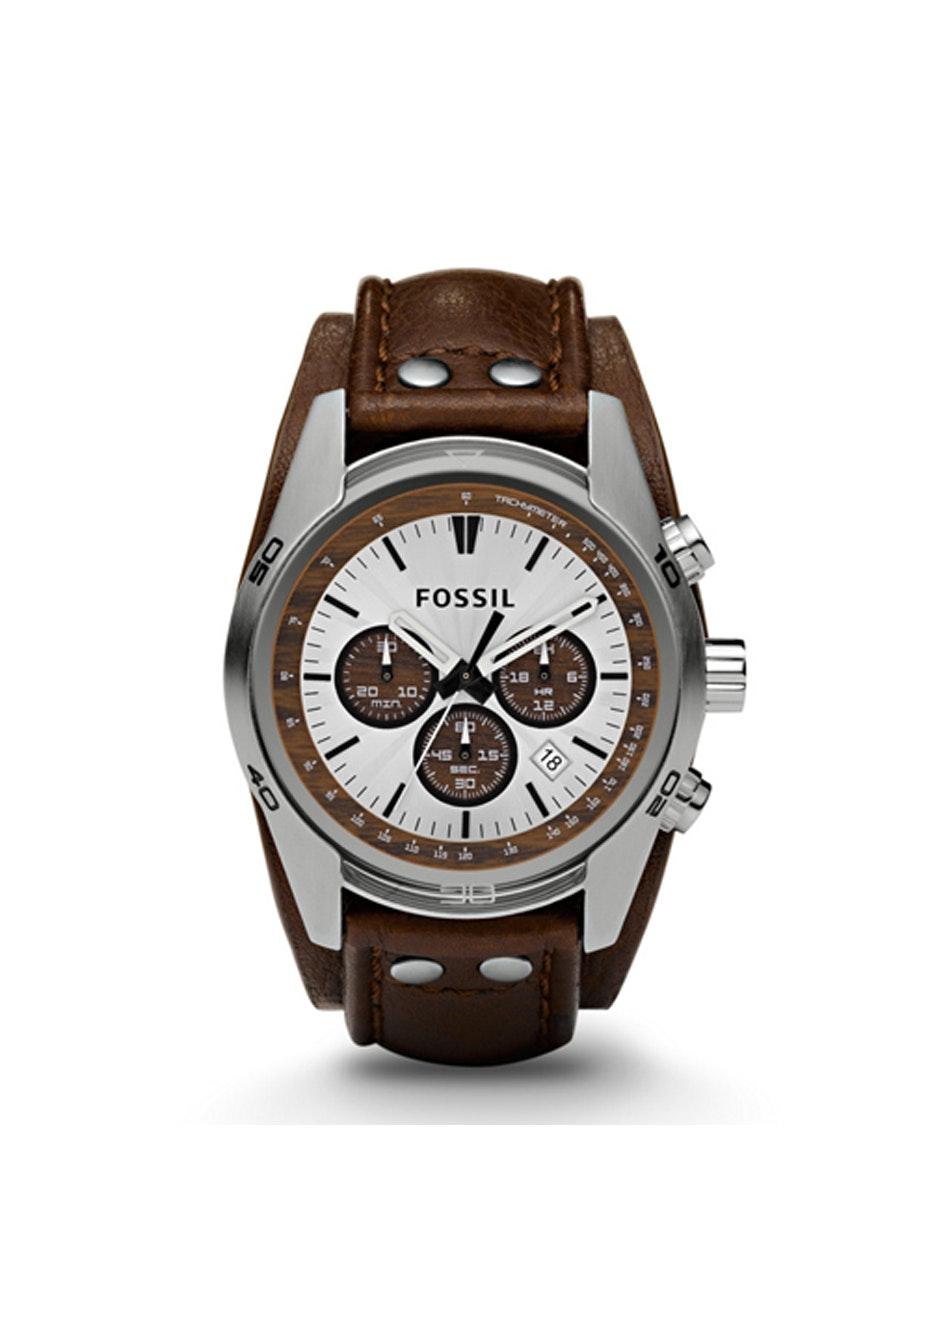 Fossil Men's Coachman - Silver/Brown